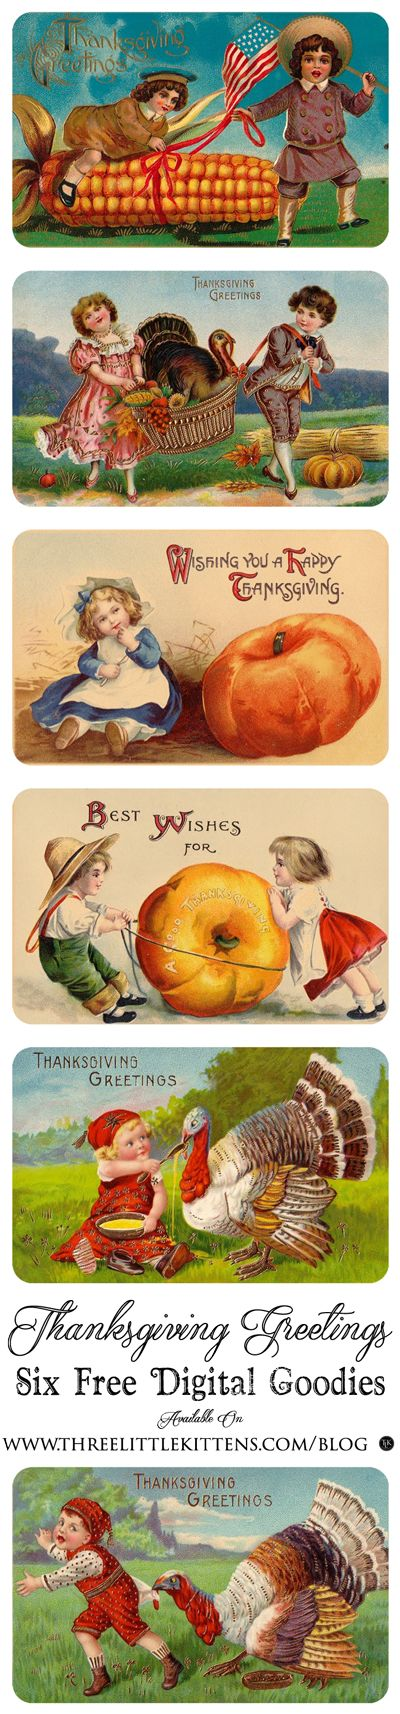 Thanksgiving Greetings - Digital Goodies on threelittlekittens.com/blog - Six different Thanksgiving stickers made from vintage ephemera